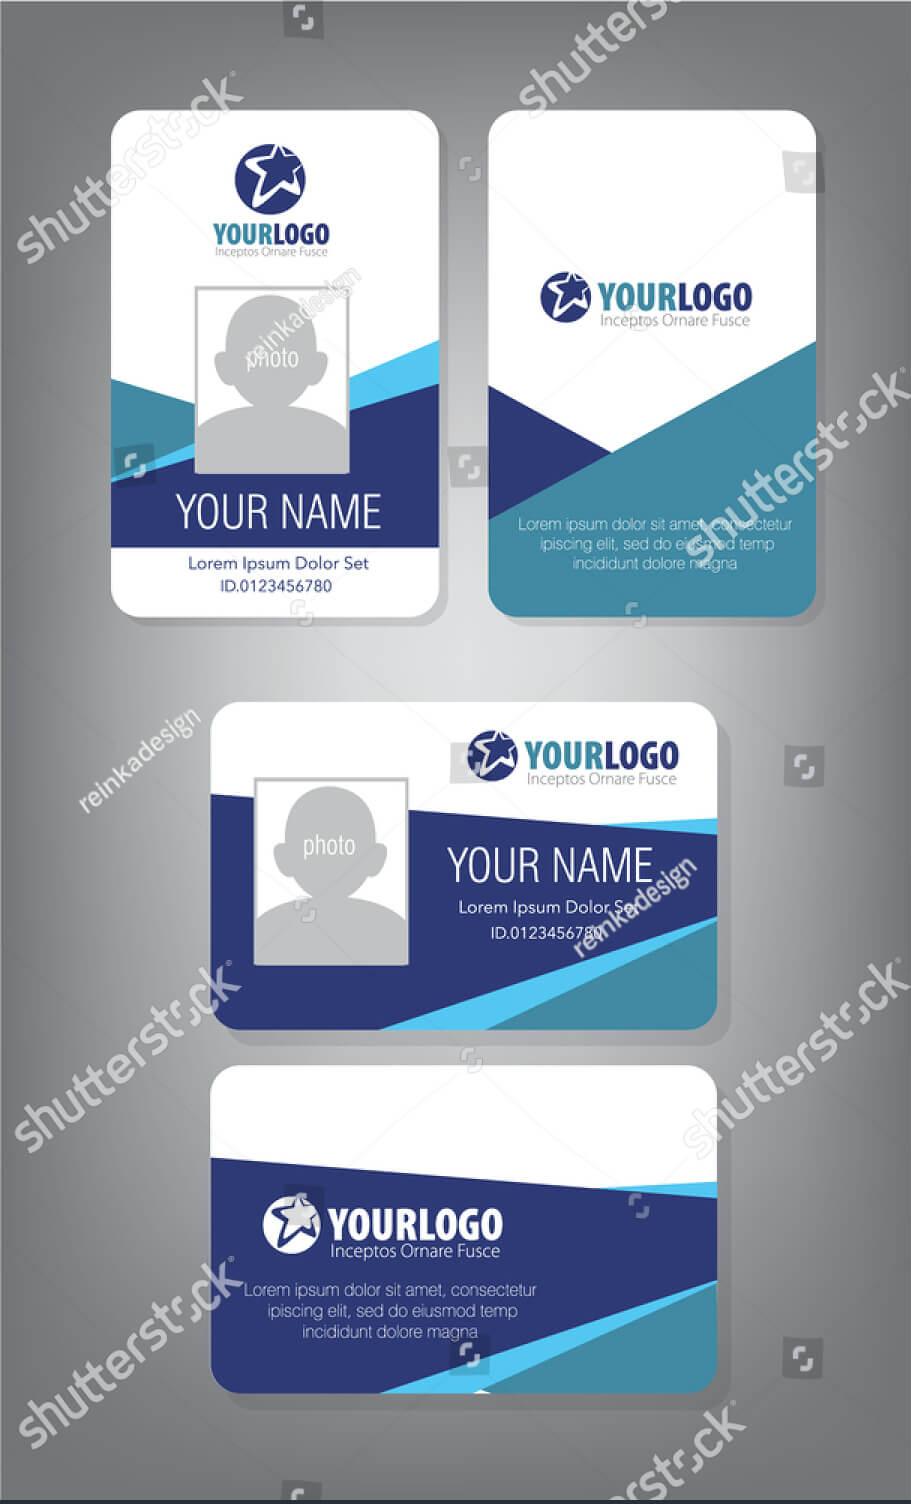 43+ Professional Id Card Designs - Psd, Eps, Ai, Word   Free regarding Id Card Template Ai